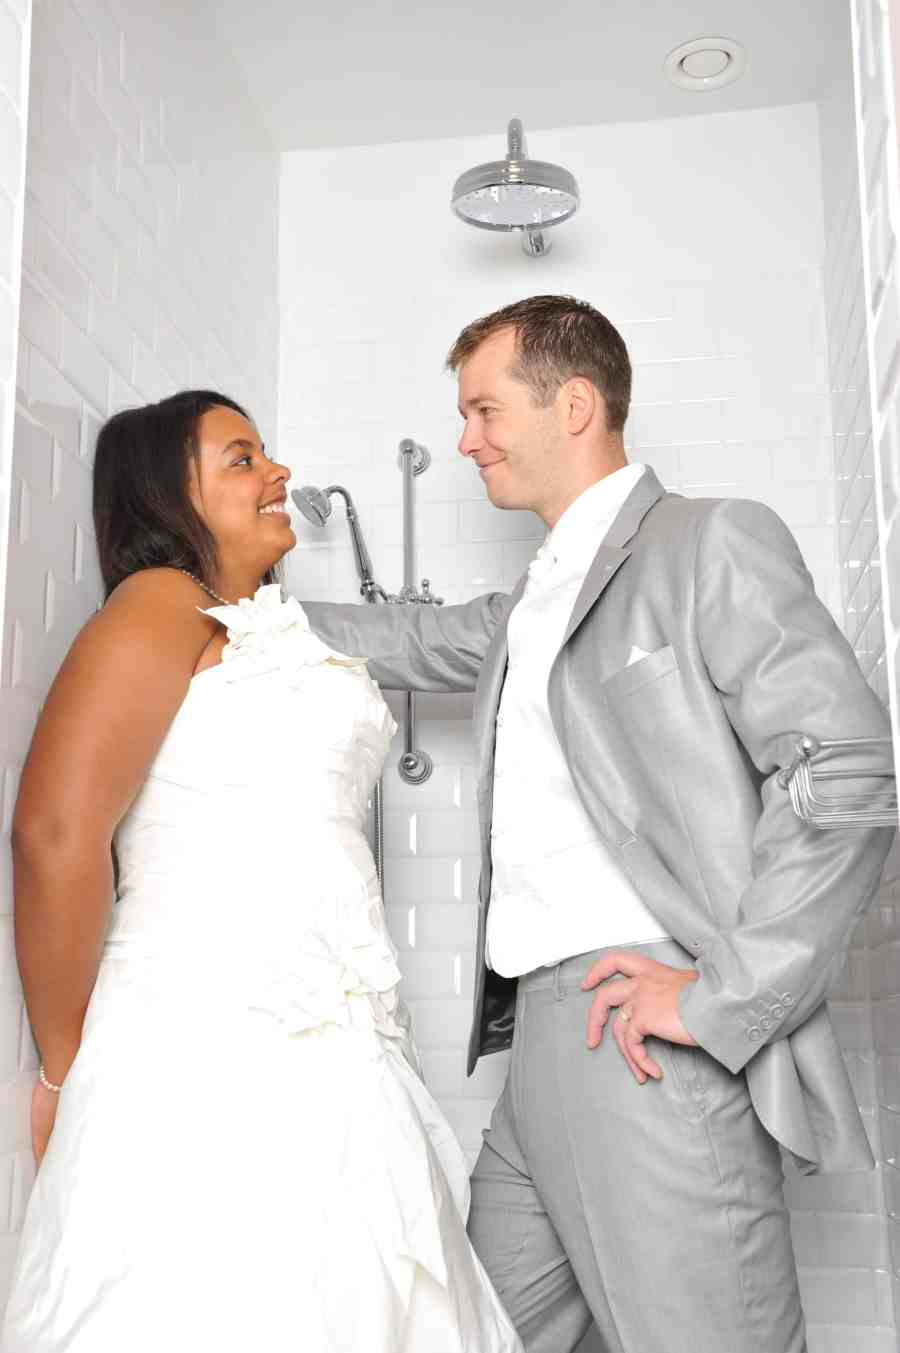 mariés-douche-casa-romantico-bruges